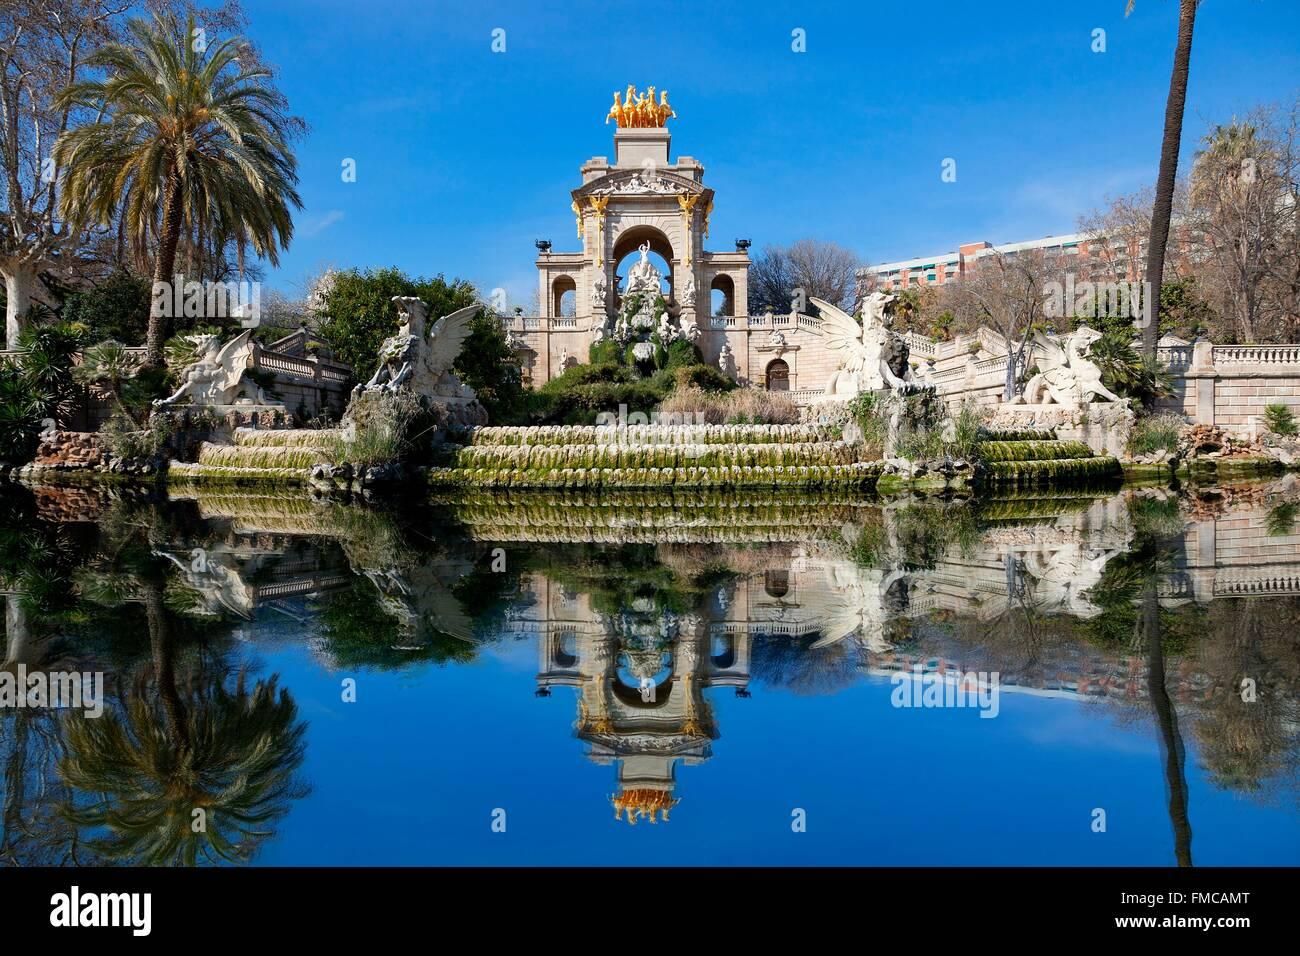 Spanien, Katalonien, Barcelona, Brunnen von Ciutadella Park Stockbild